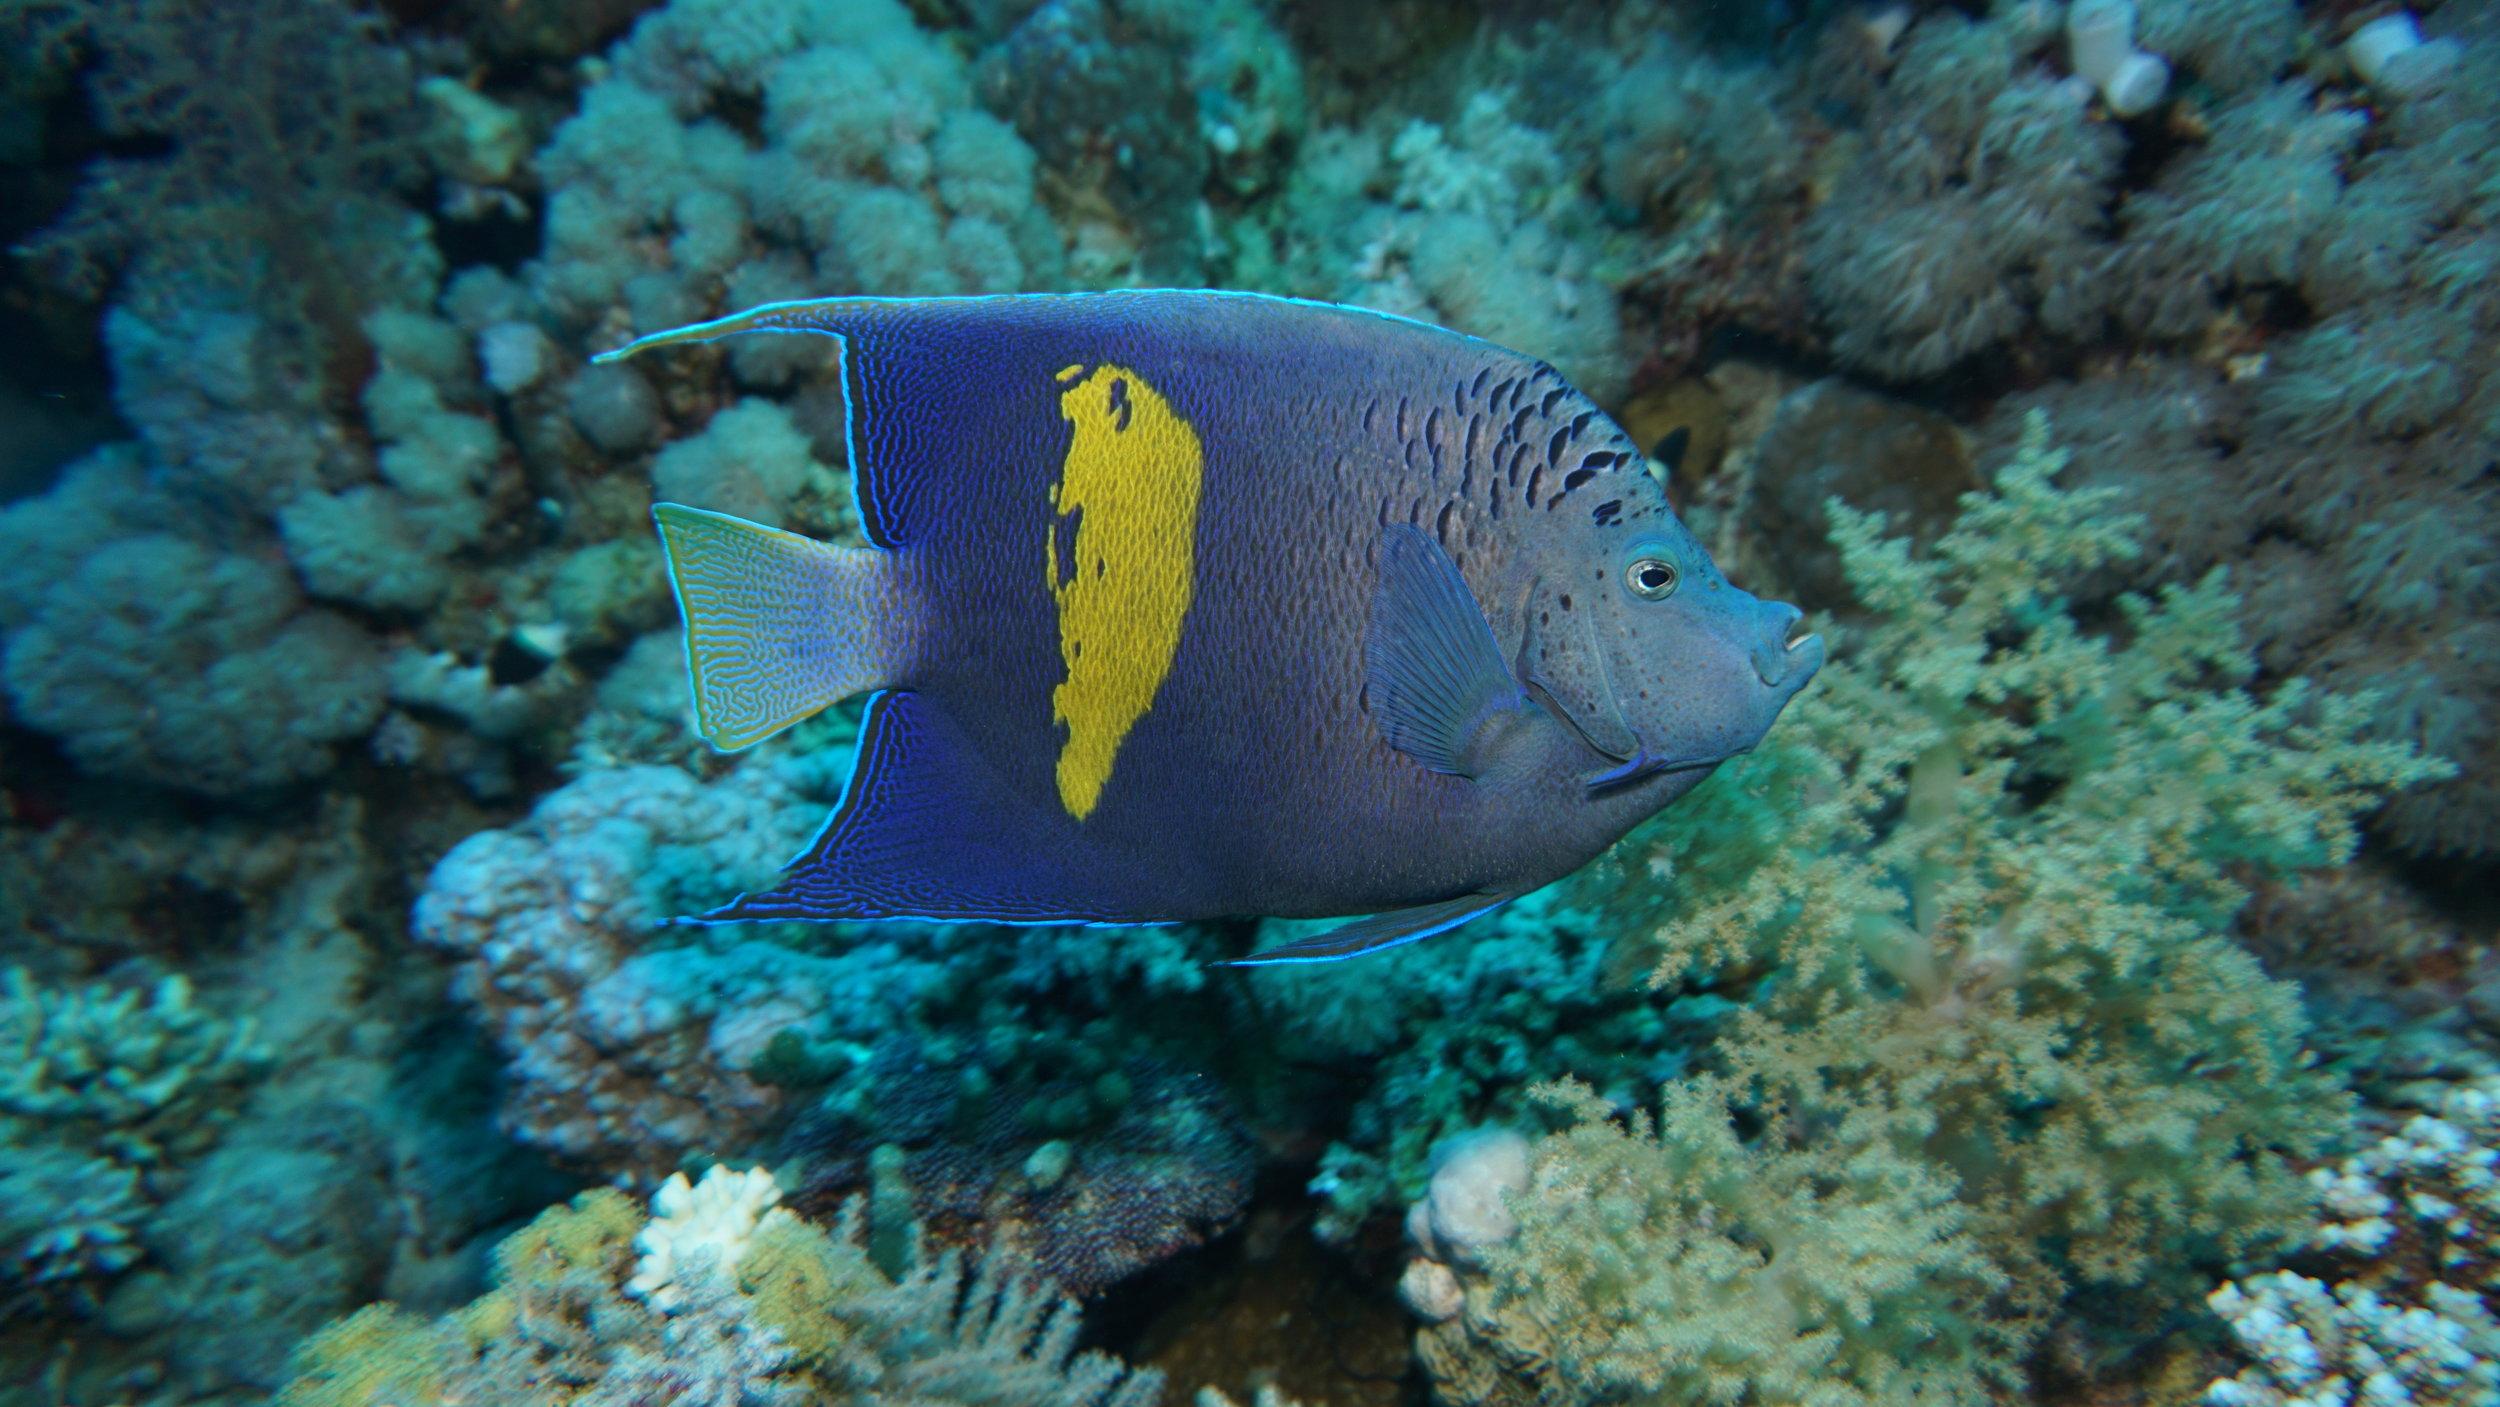 Yellowbar angelfish credit: Ceyhan Bekiroglu / coral reef image bank